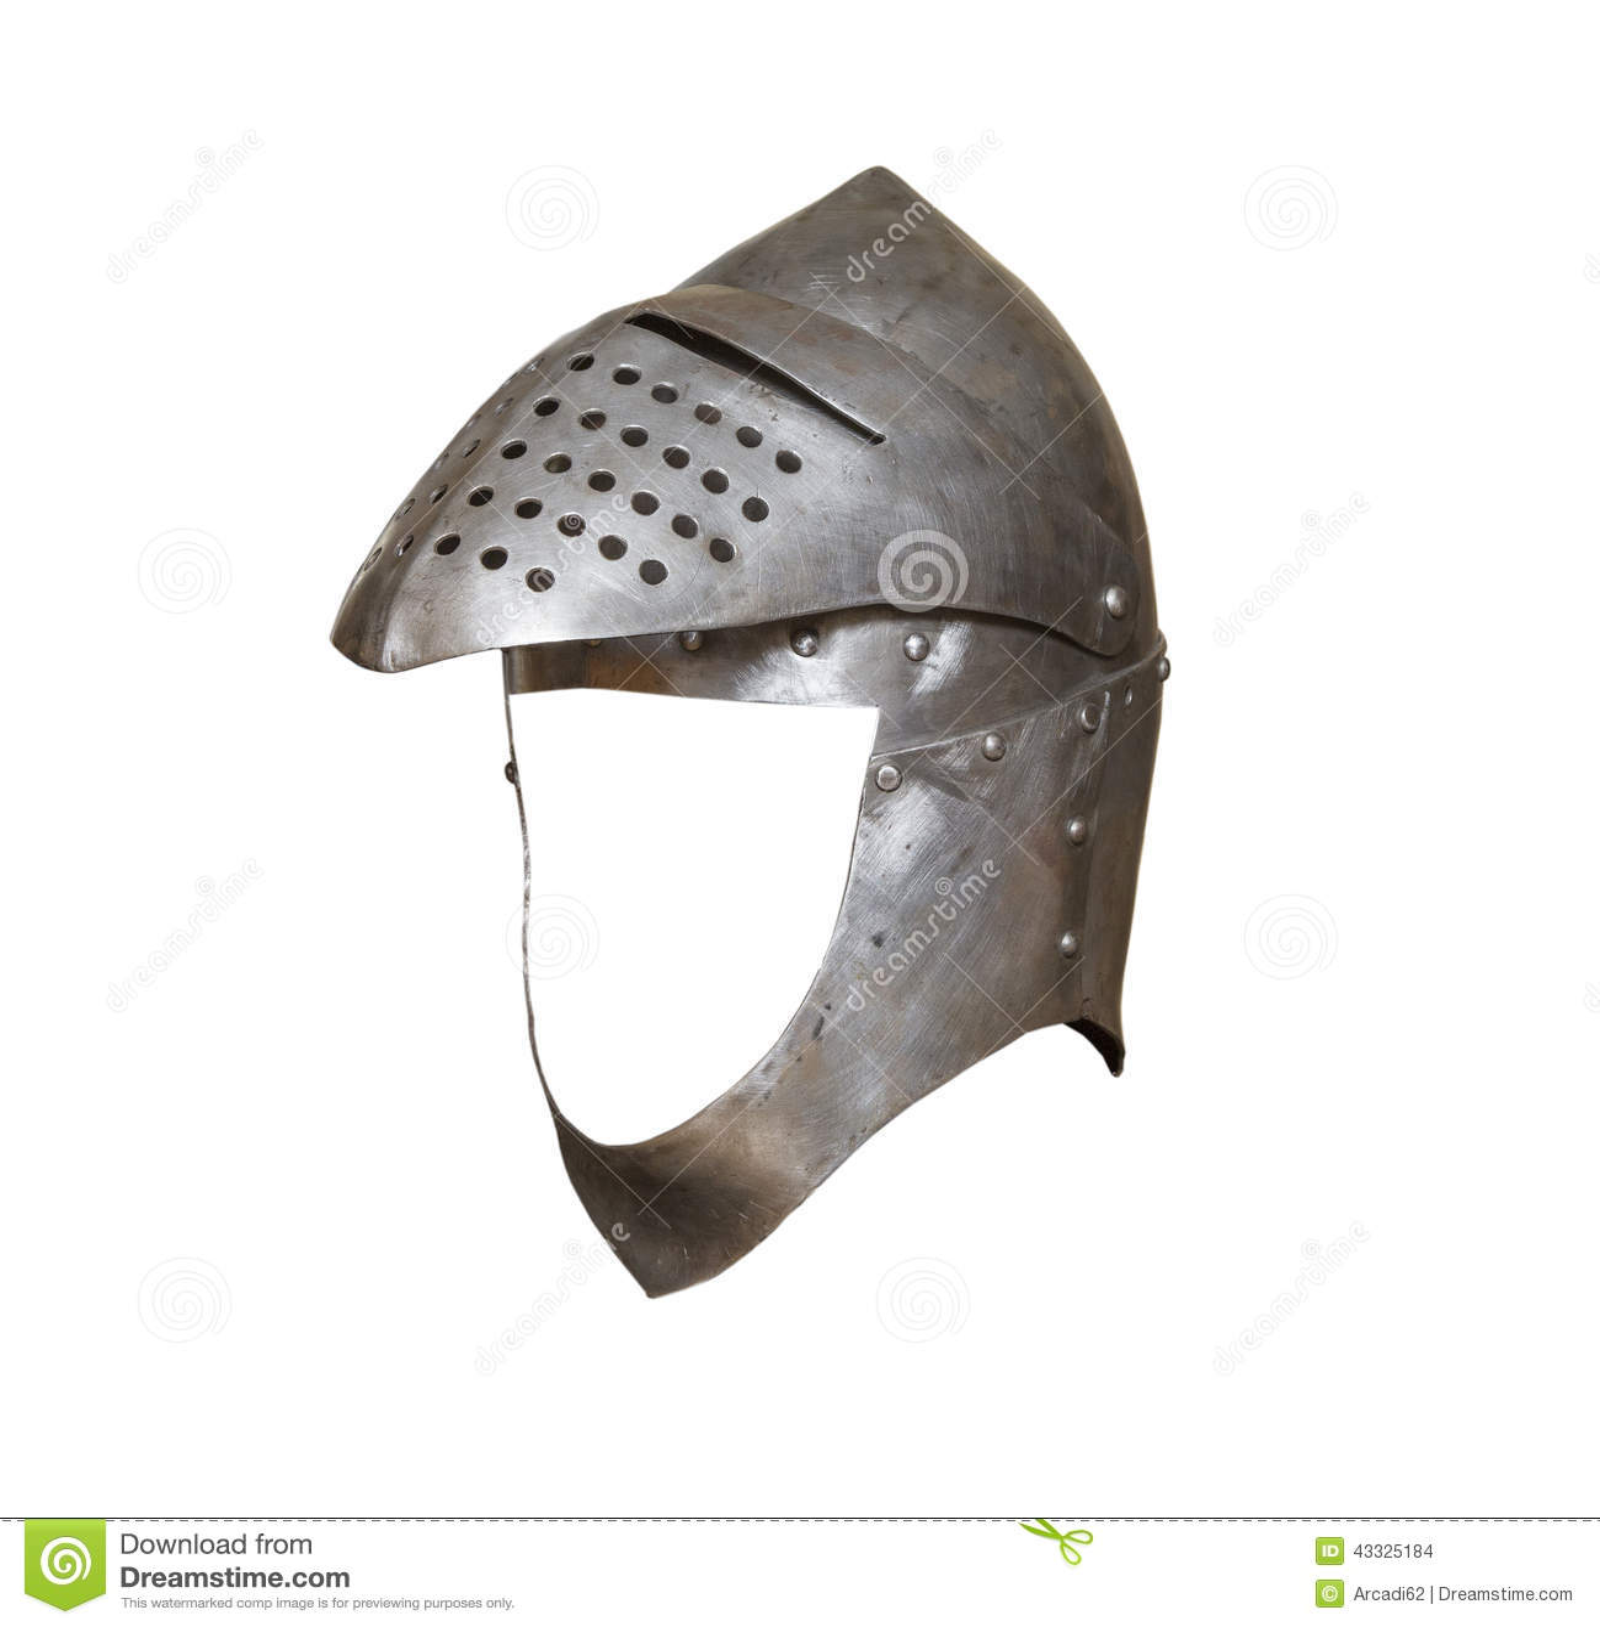 knights helmet stock photo image of helmet battle protection